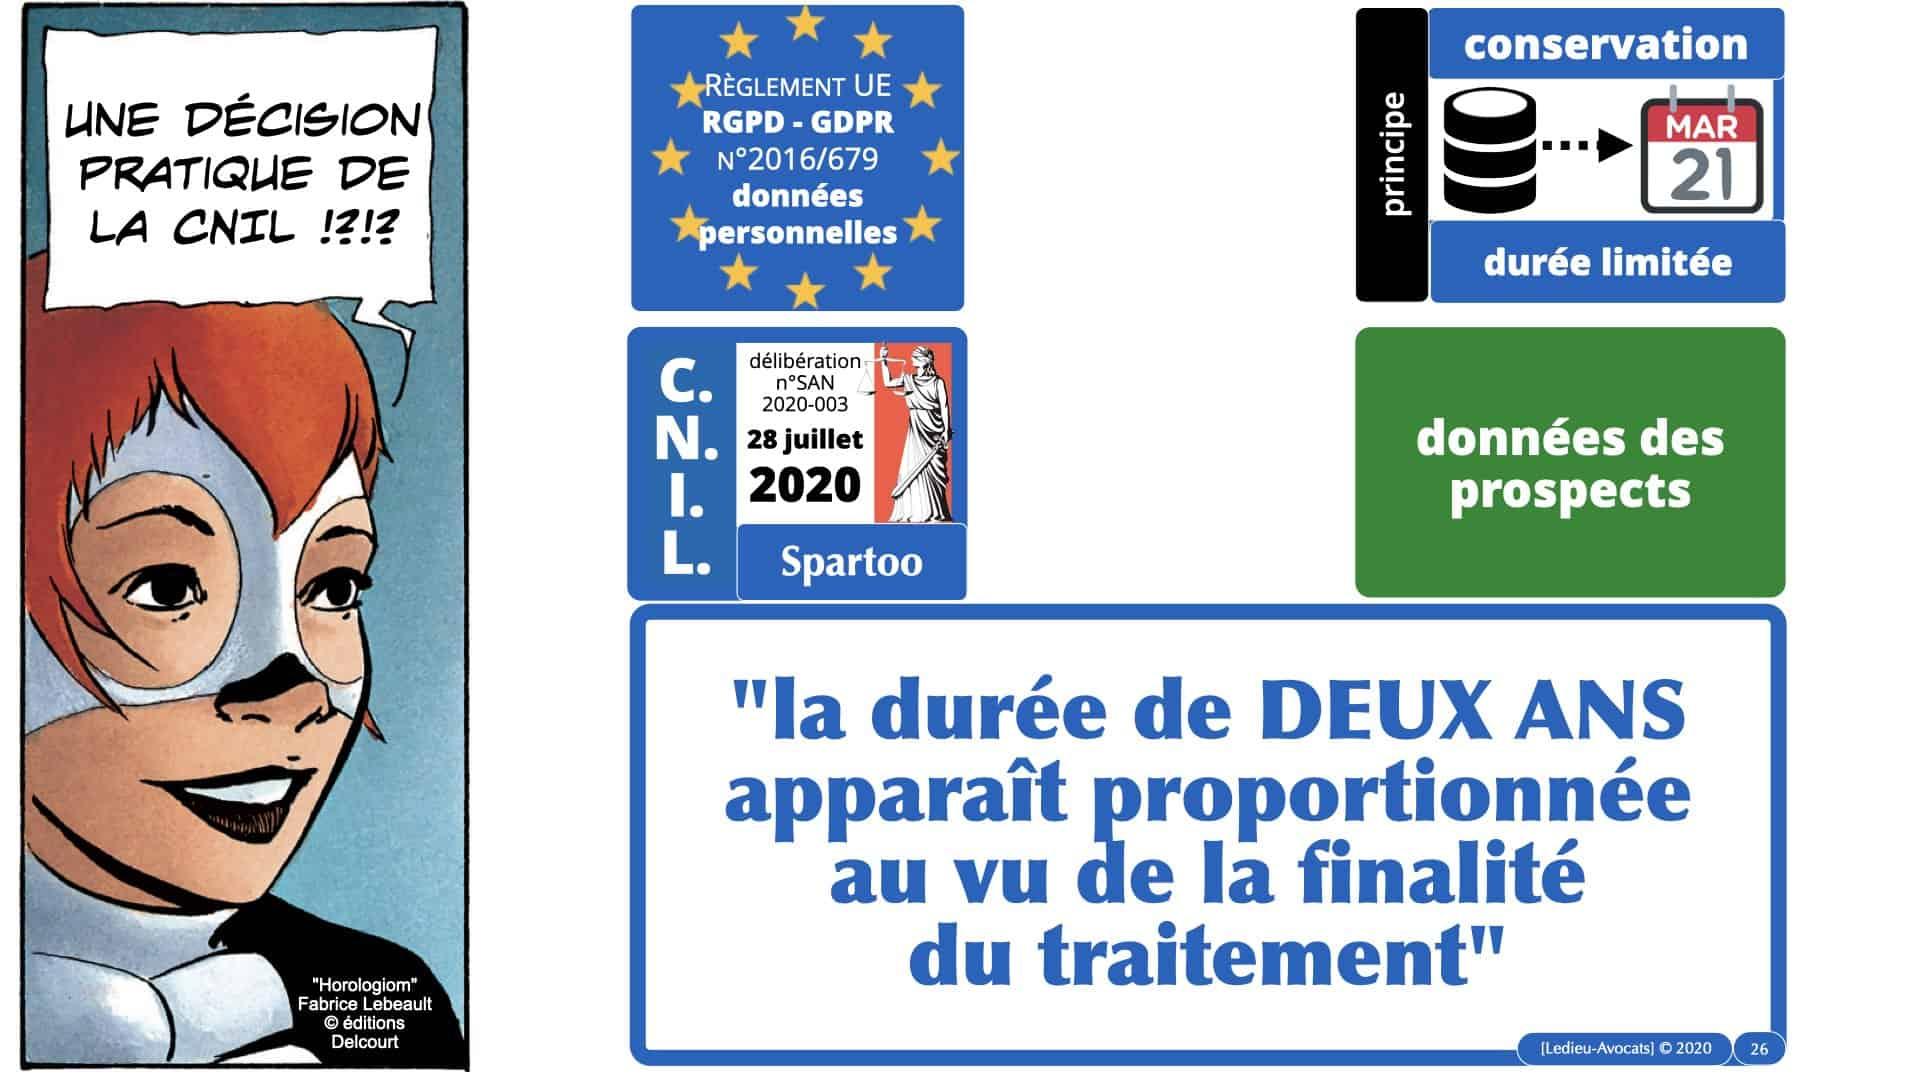 RGPD délibération CNIL Spartoo du 28 juillet 2020 n°SAN 2020-003 PRINCIPE